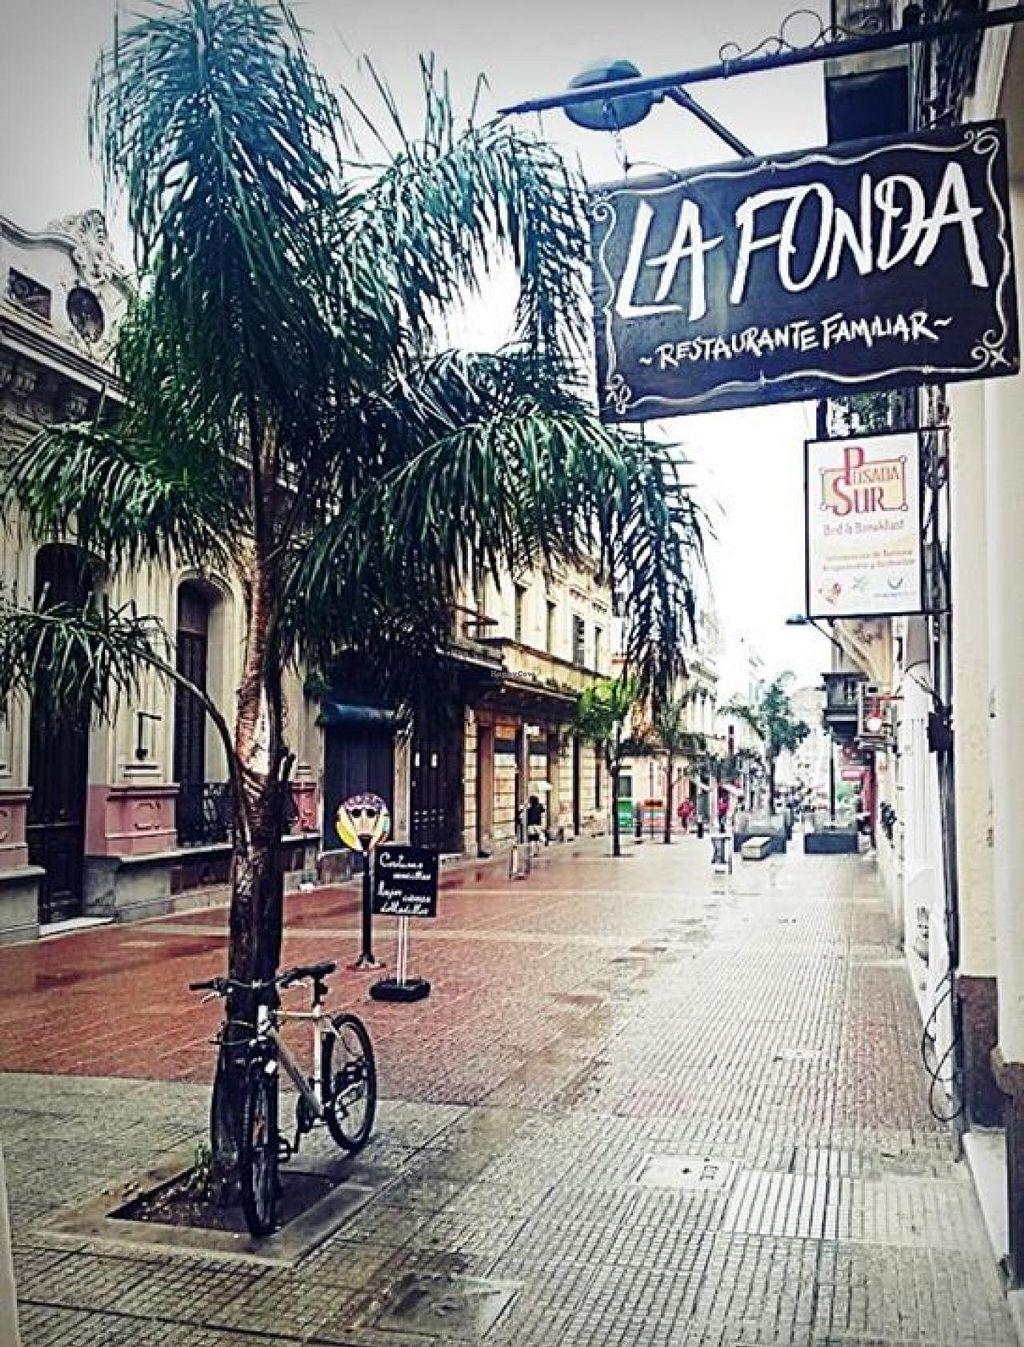 "Photo of La Fonda  by <a href=""/members/profile/community"">community</a> <br/>La Fonda <br/> March 2, 2015  - <a href='/contact/abuse/image/55819/94632'>Report</a>"